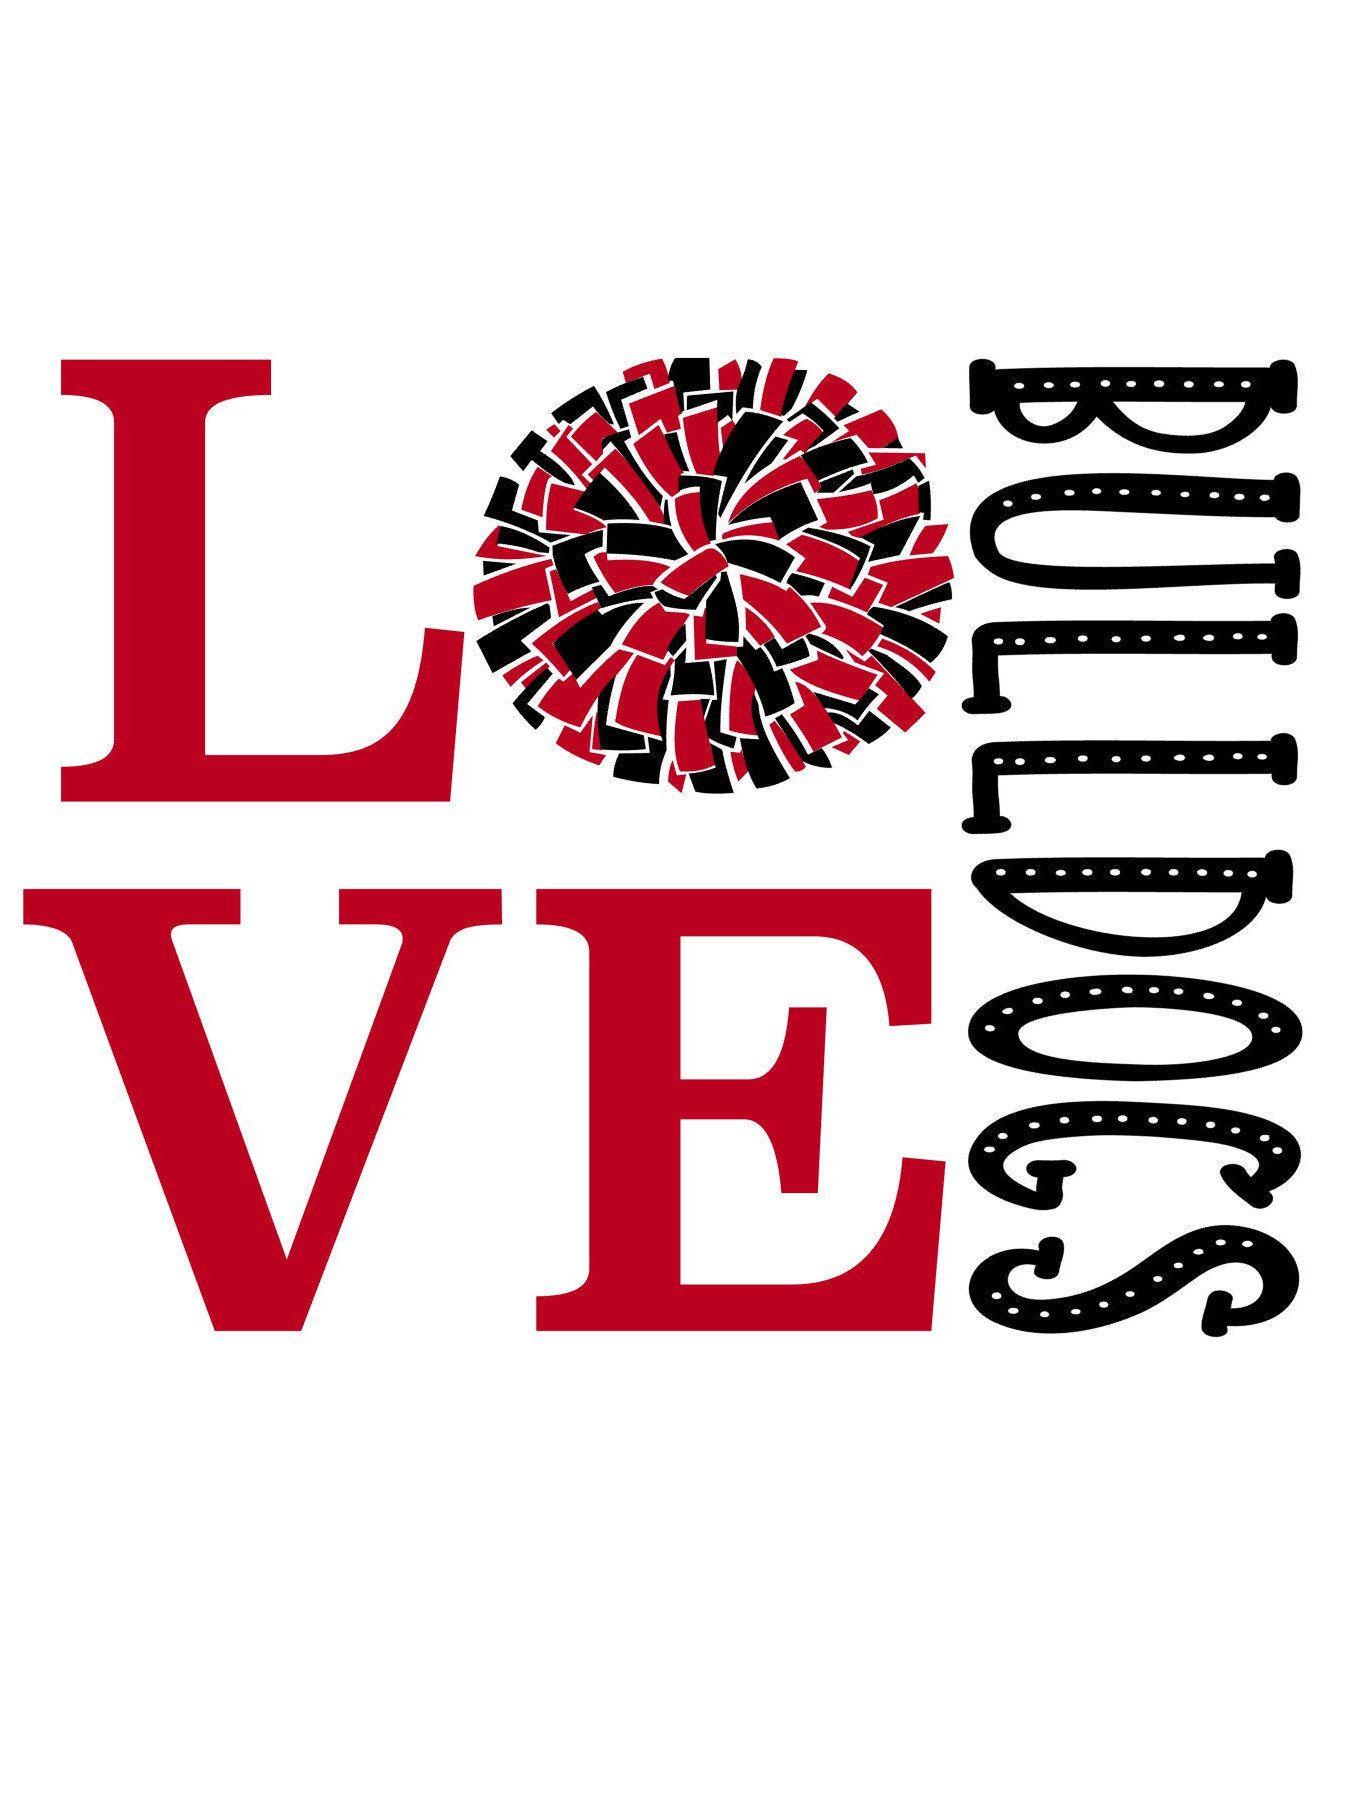 Download Love Bulldogs Cheer SVG | Cheer shirts, School spirit ...